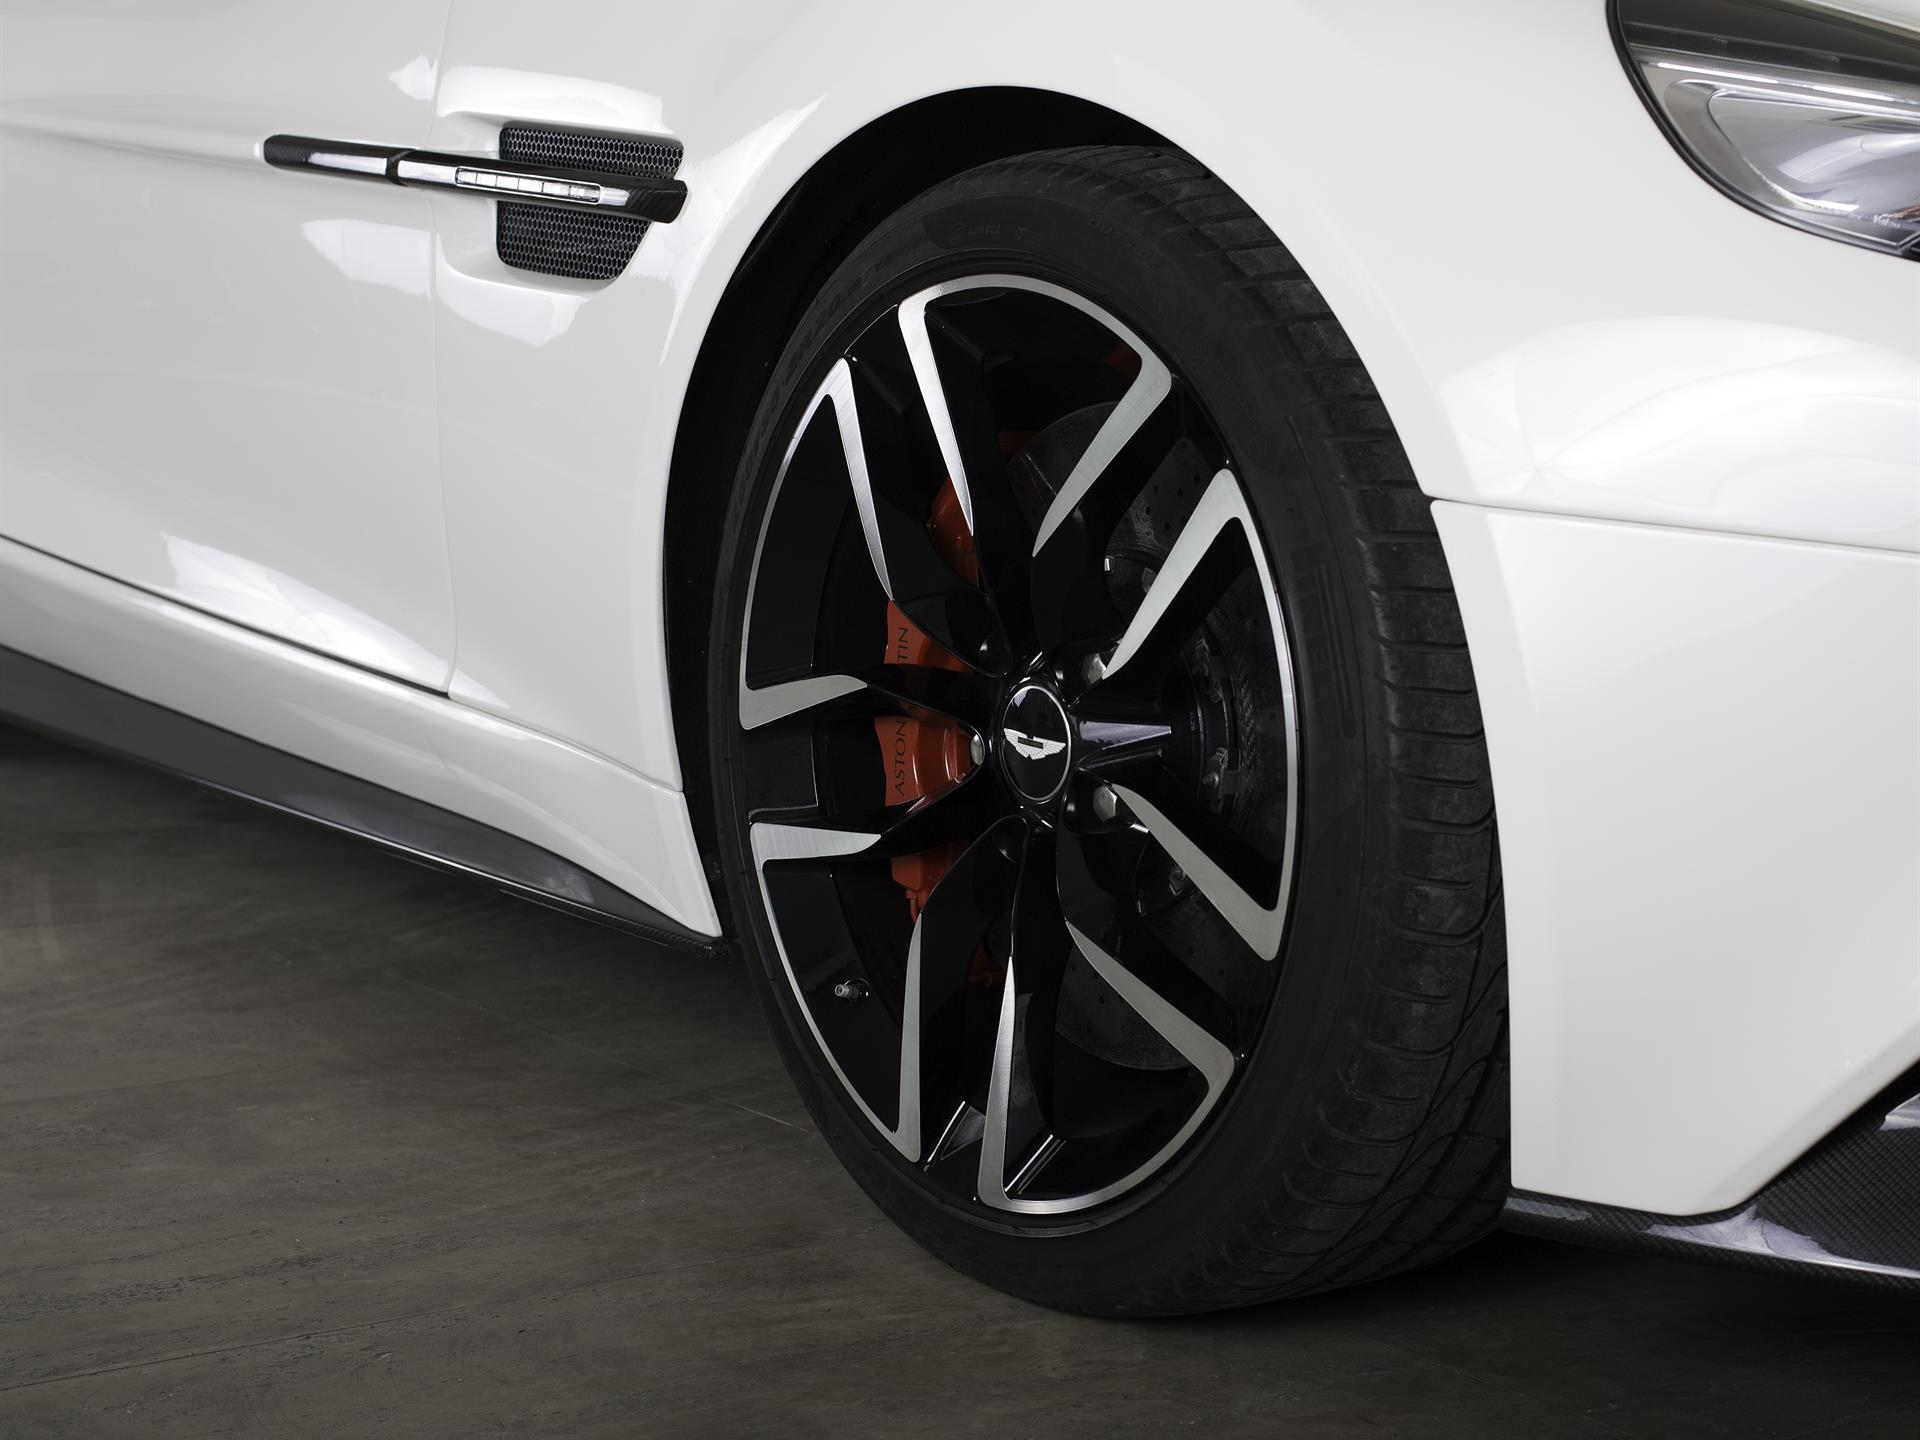 Aston Martin Lagonda PreOwned Used Aston Martins Car Details - Aston martin pre owned